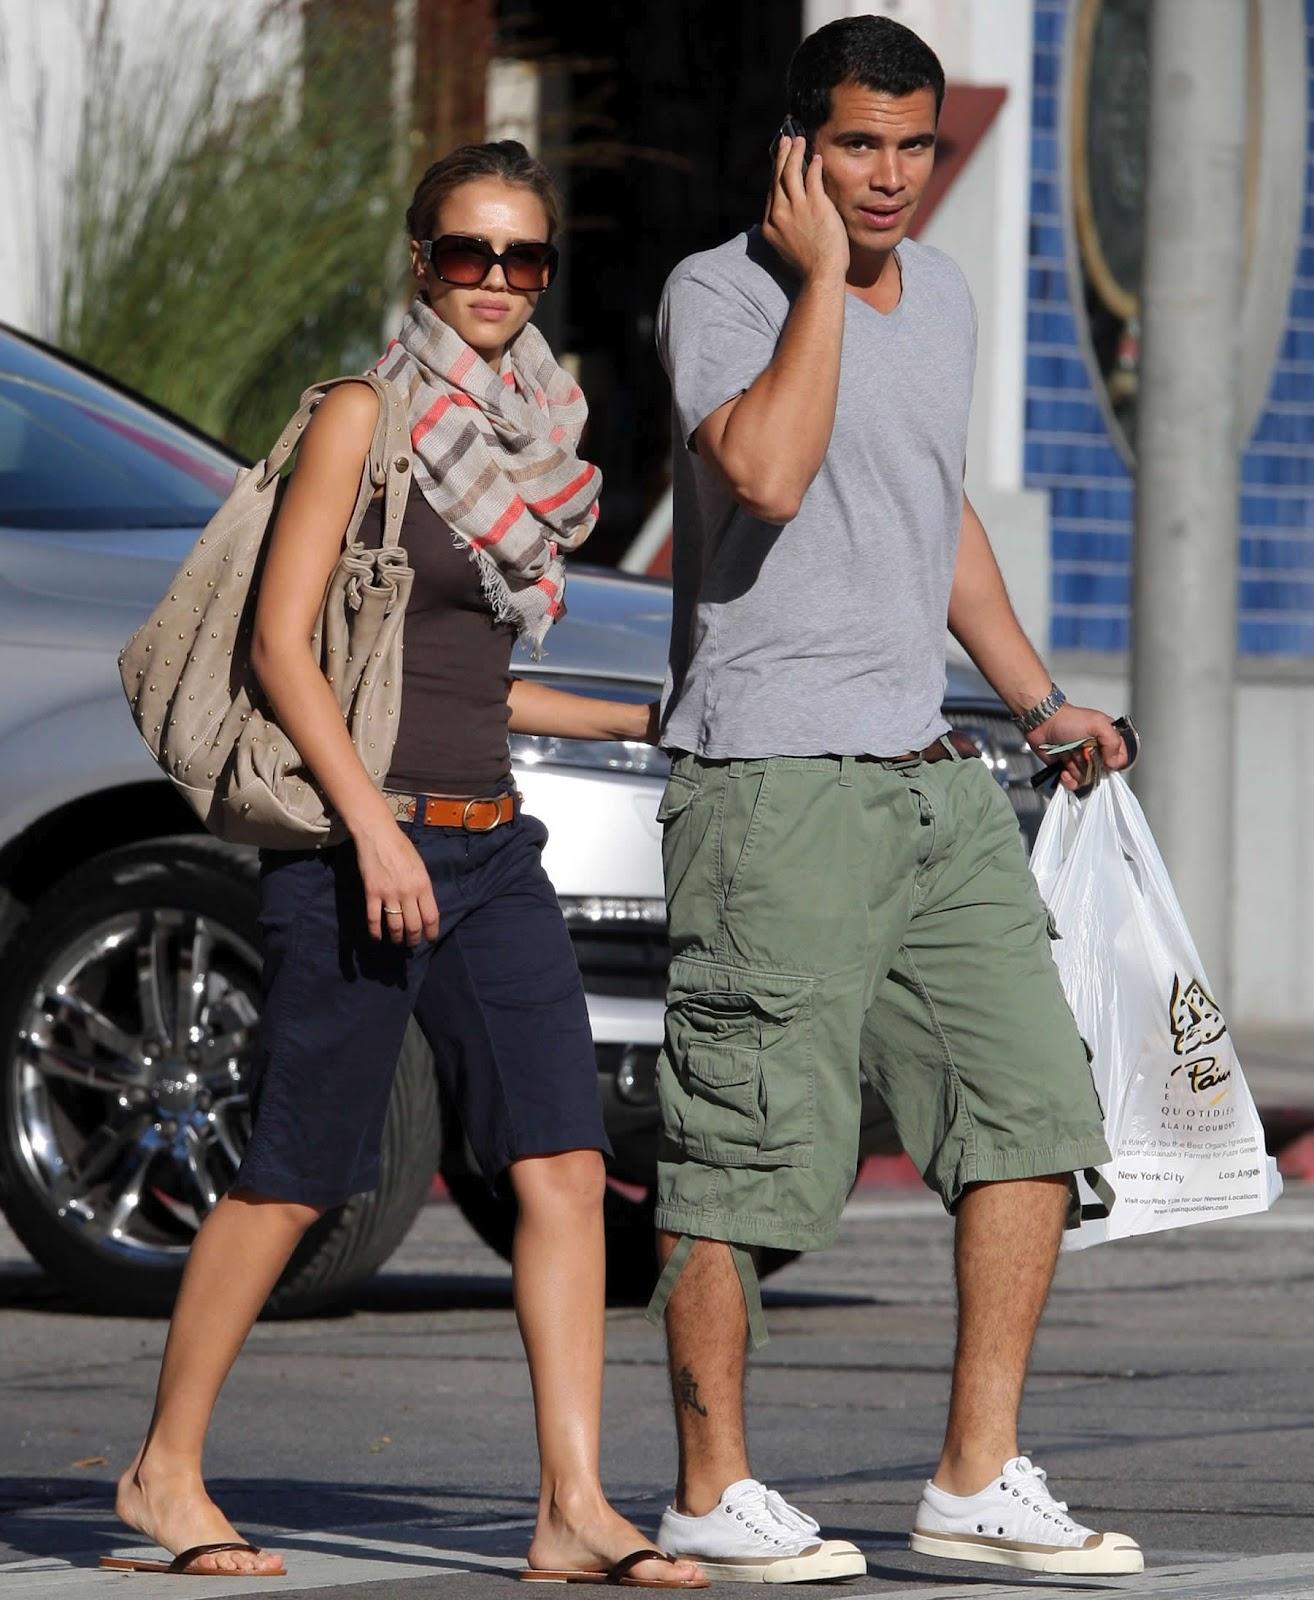 Is Jessica Alba dating Justin Timberlake